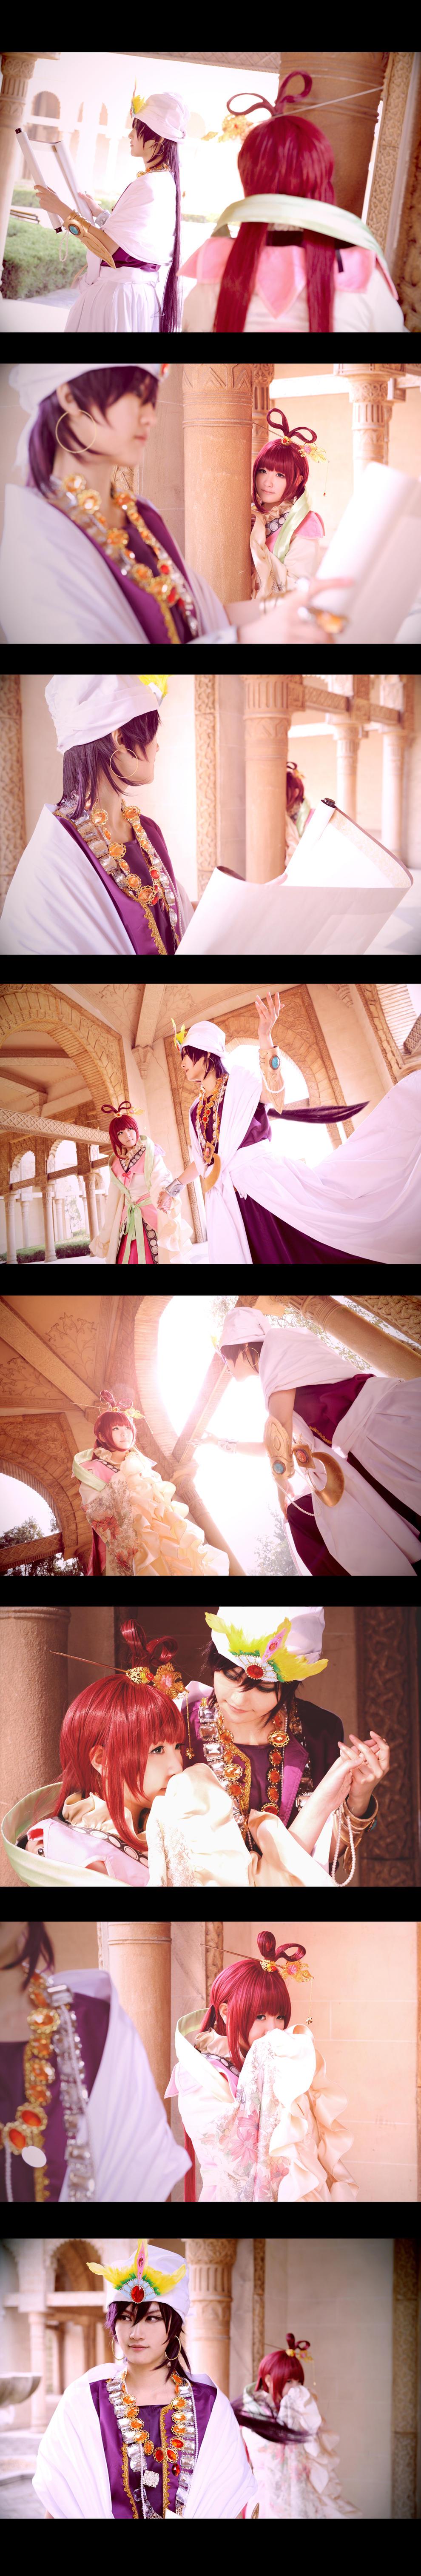 MAGI-Sindbad and Ren kogyoku by CE-Ciel